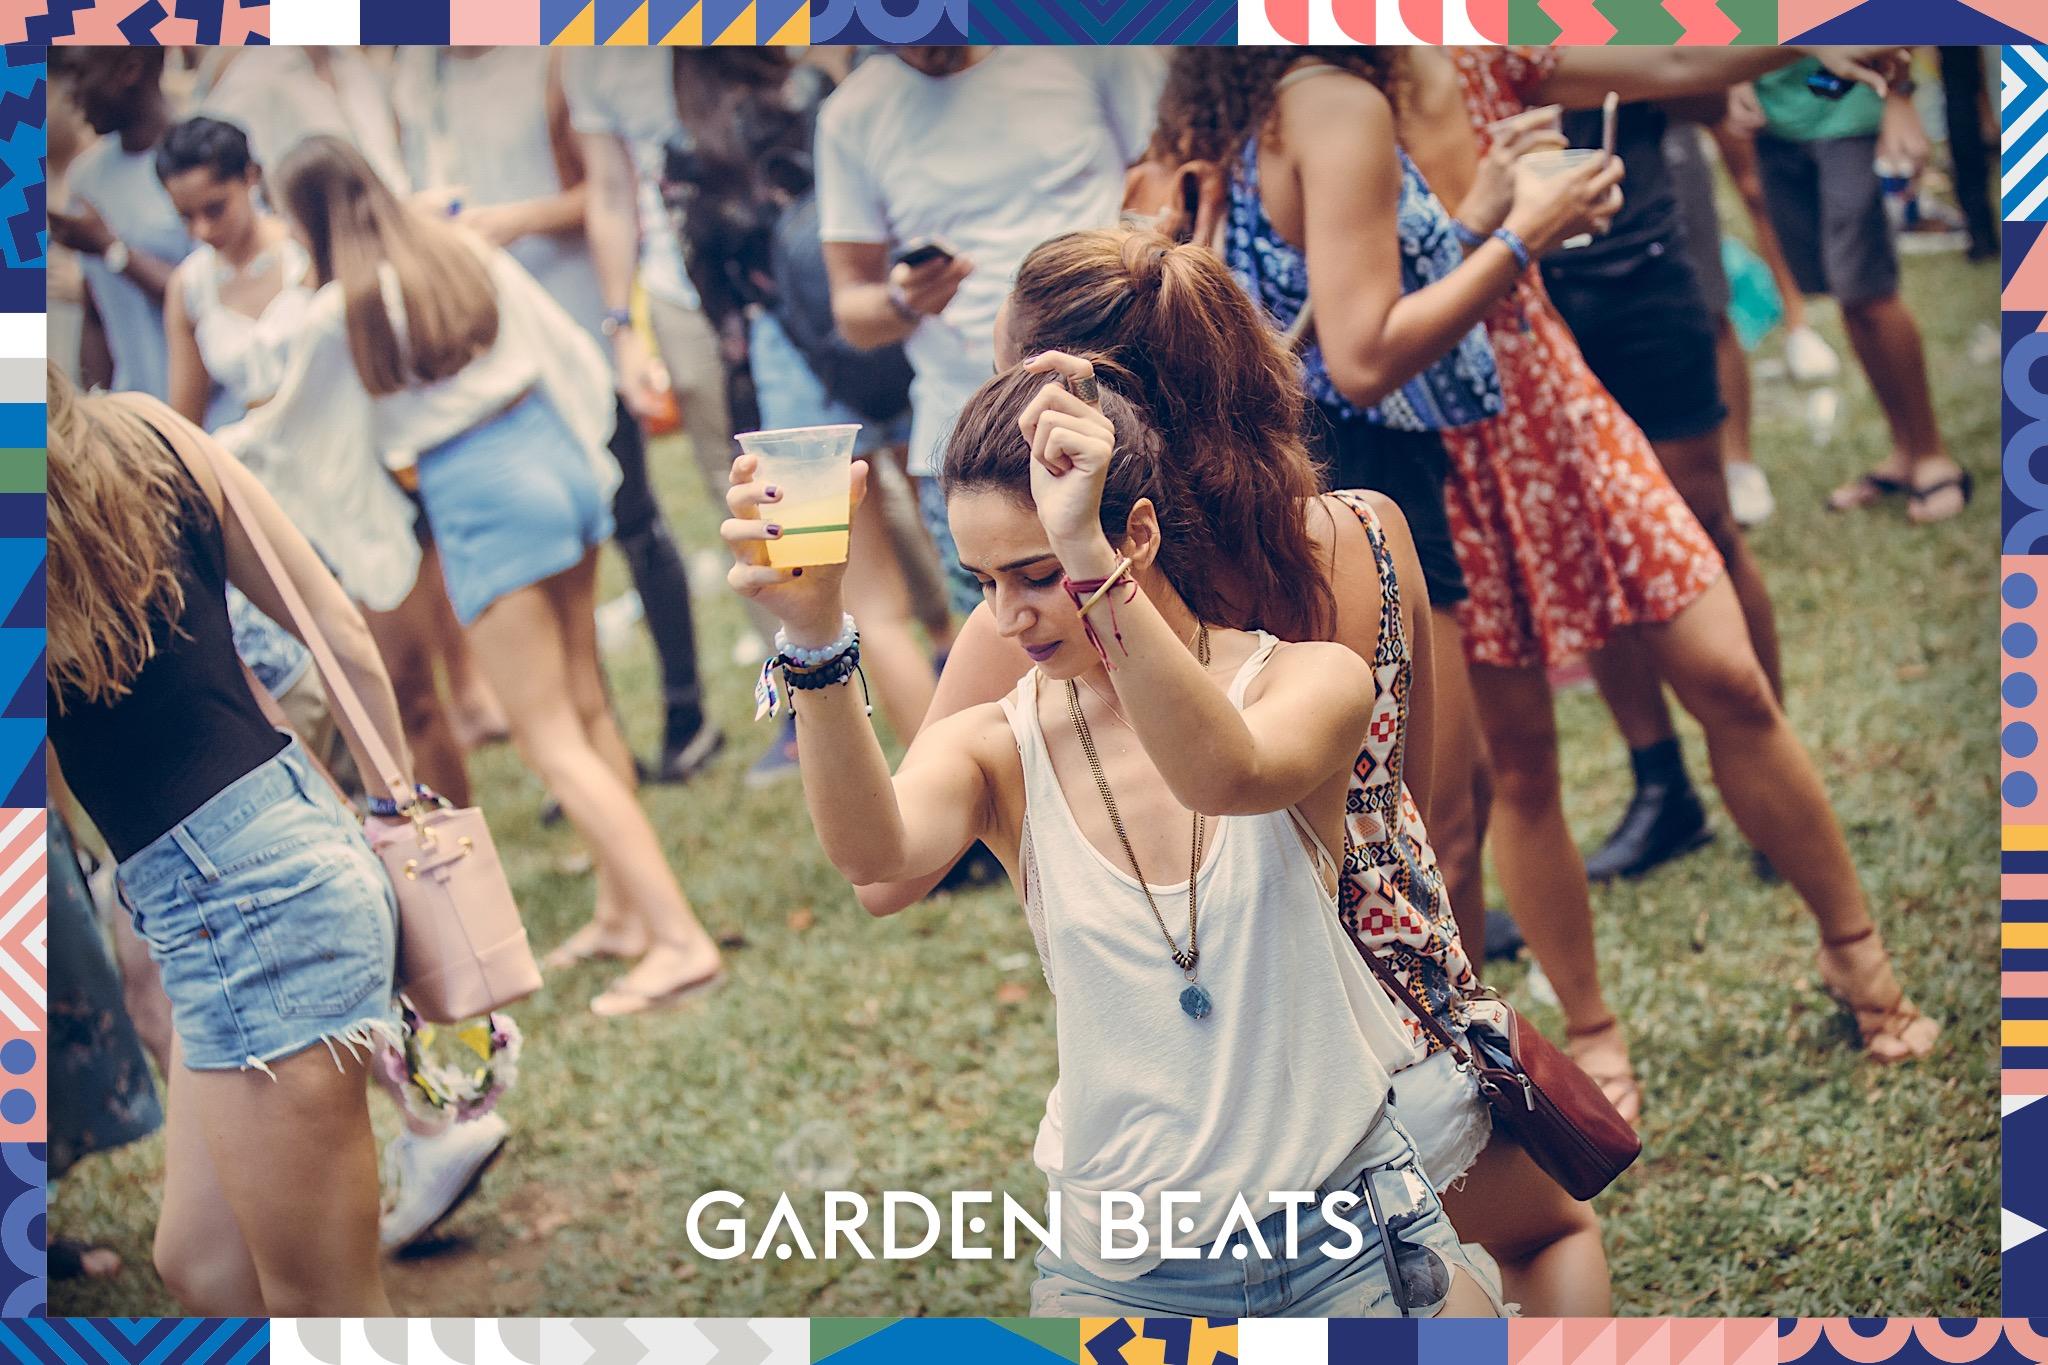 03032018_GardenBeats_Colossal594_Watermarked.jpg